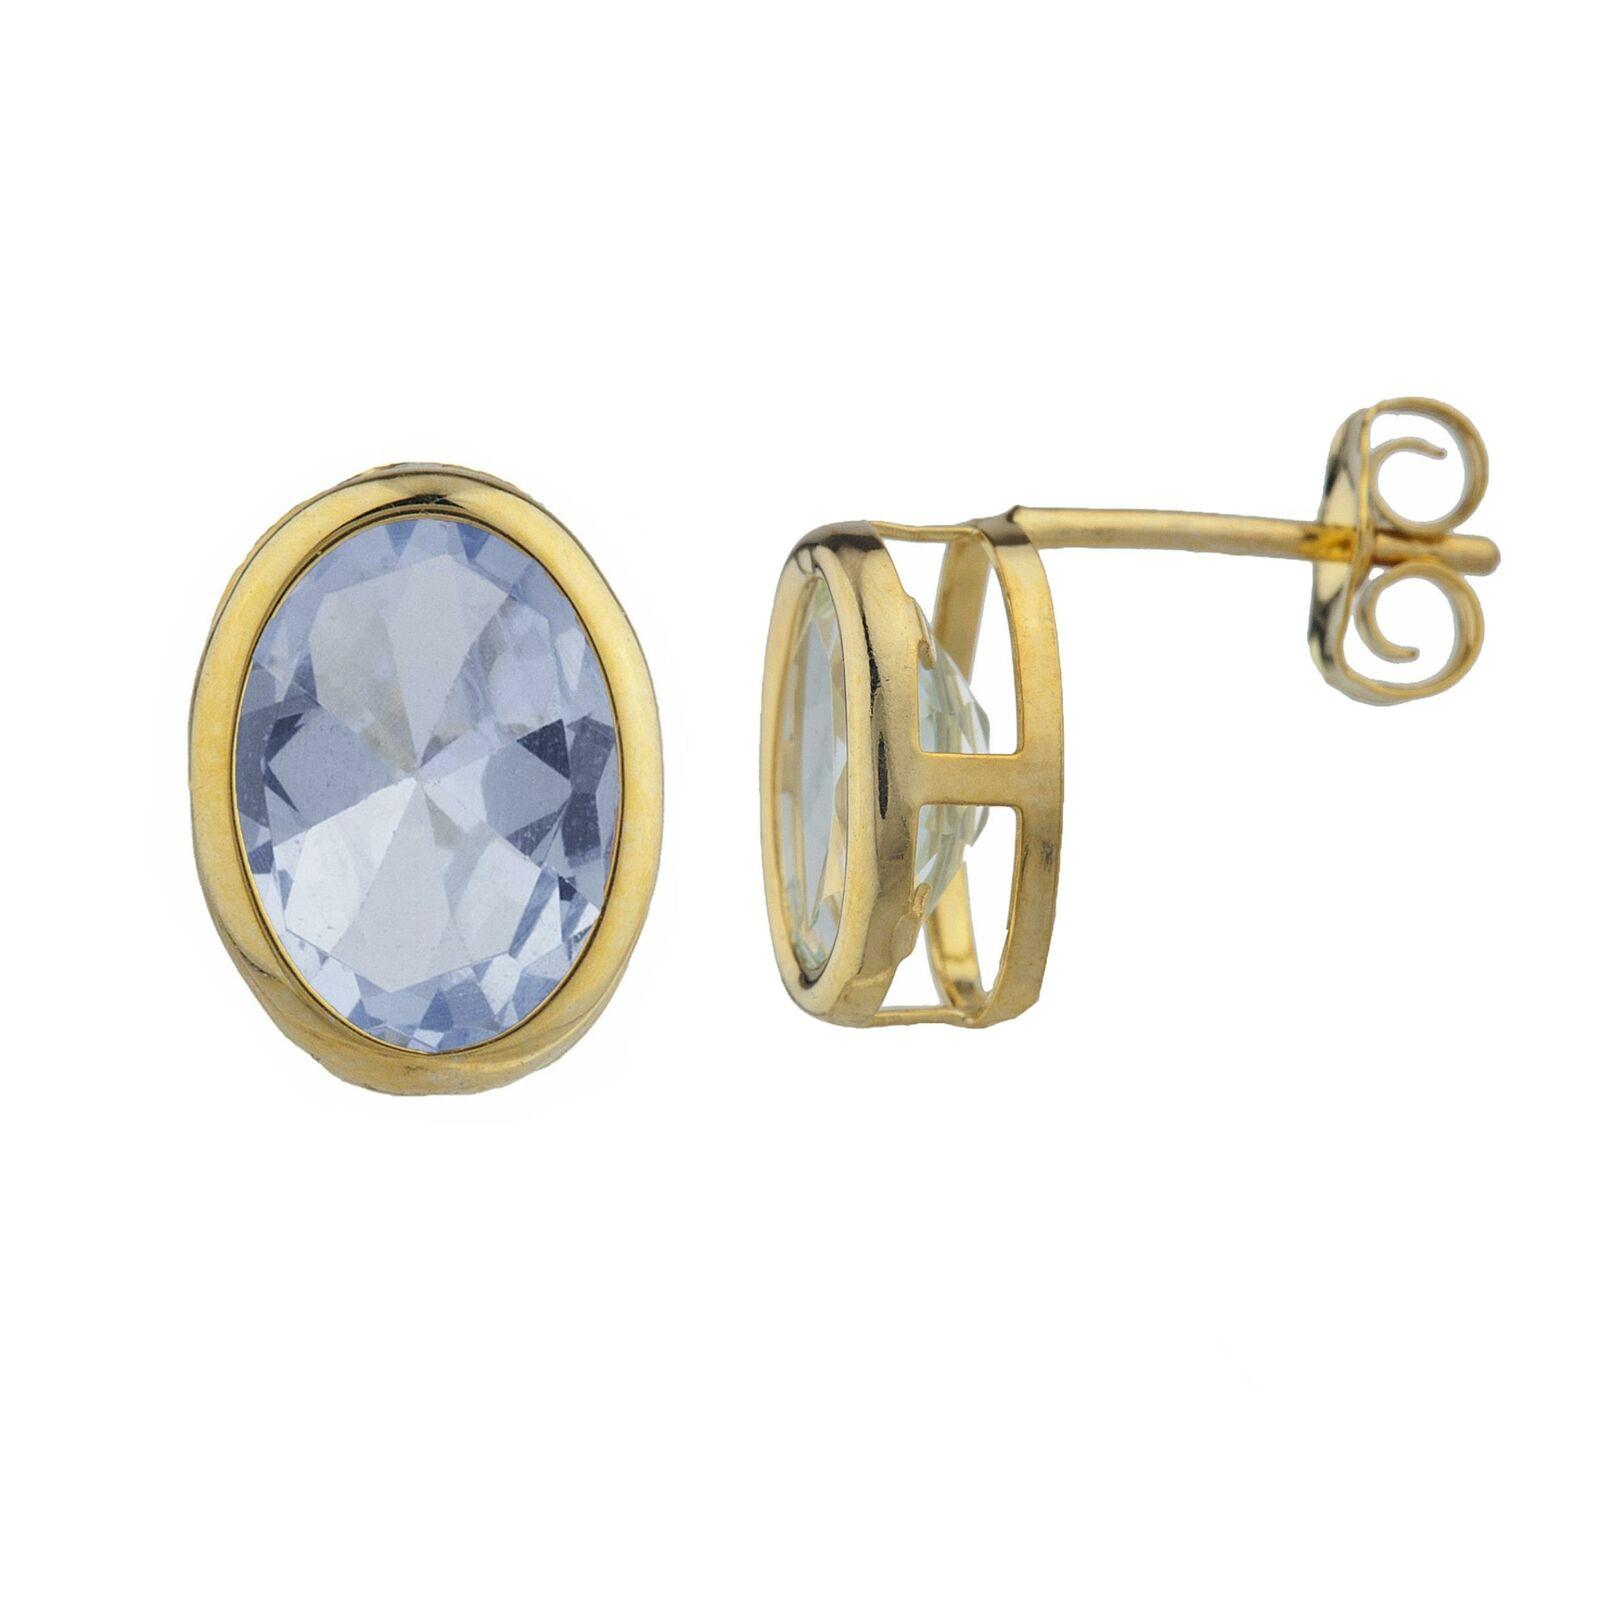 14Kt gold Aquamarine Oval Bezel Stud Earrings